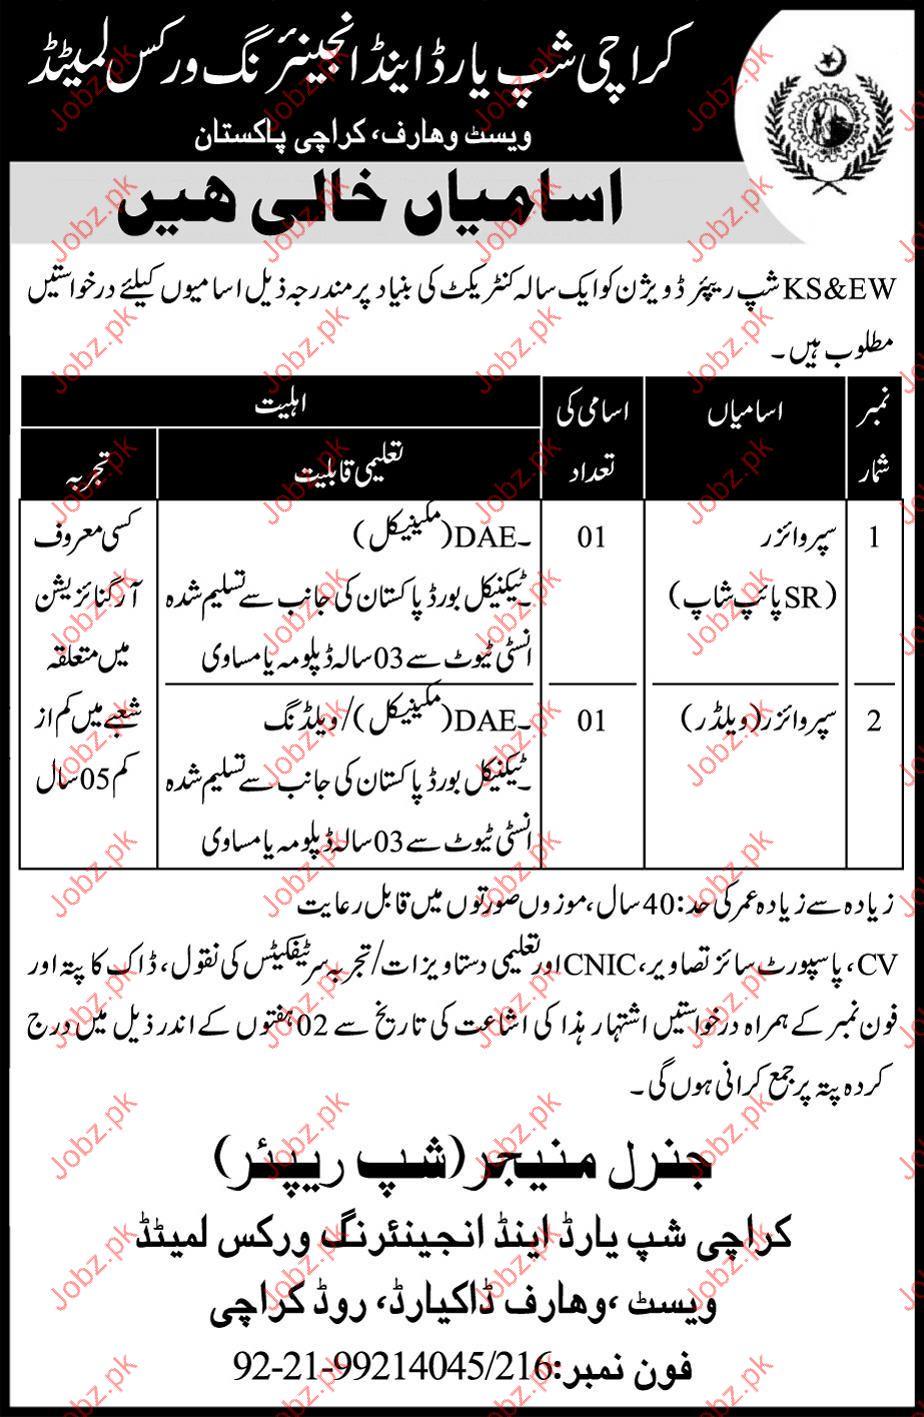 Supervisors Jobs In Karachi Shipyard & Engineering Works